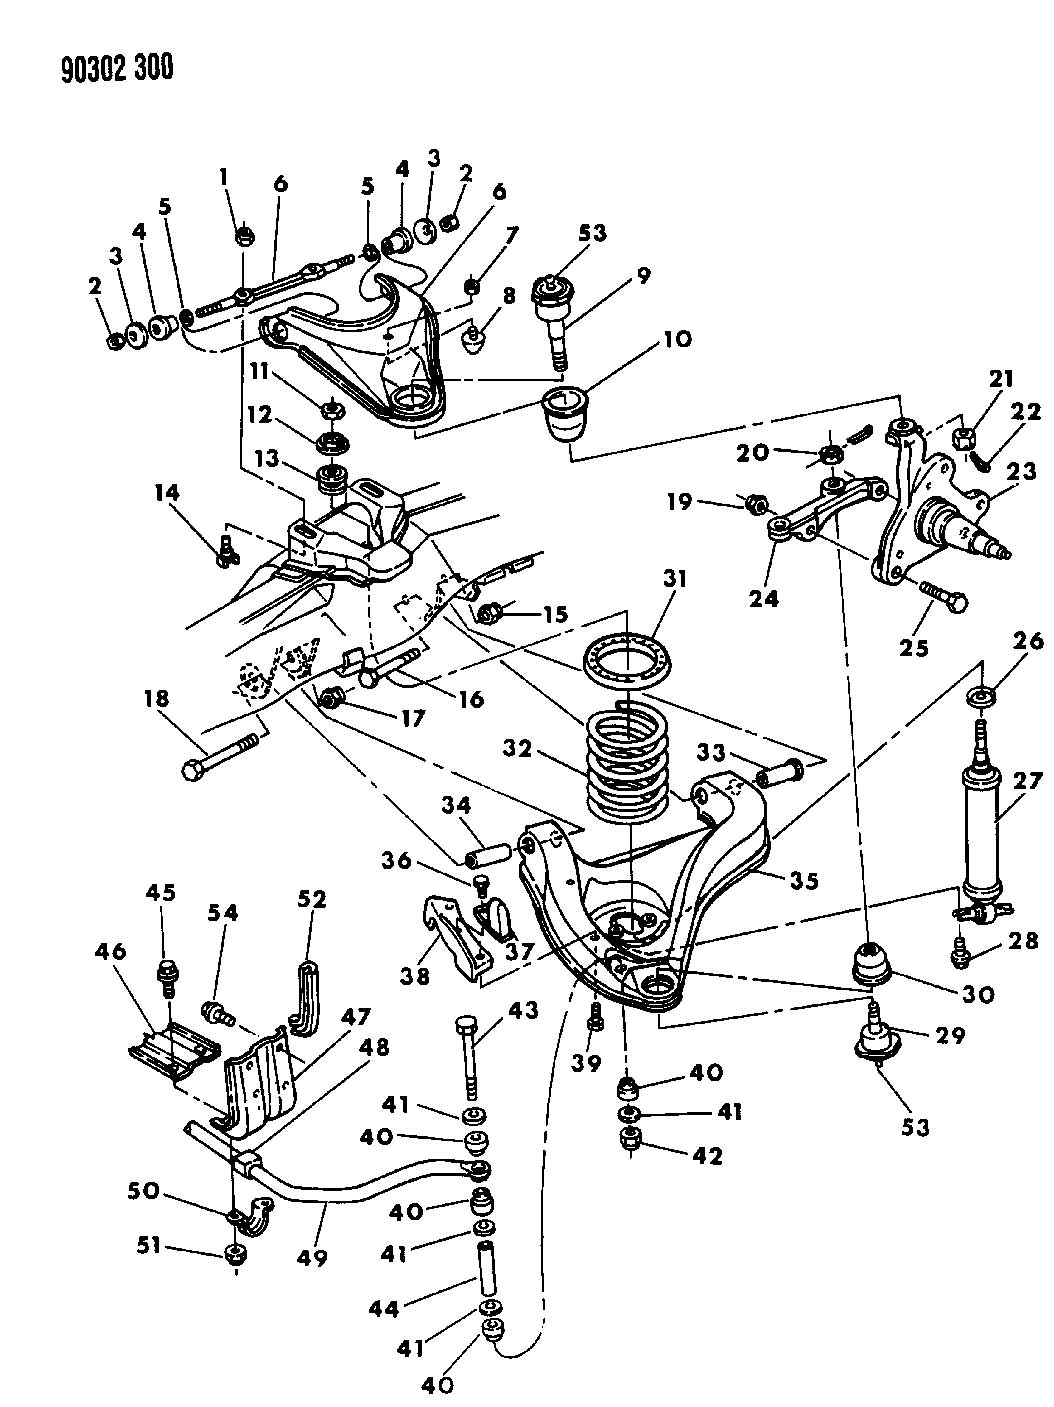 2008 Chrysler Aspen Nut. Mounting, upper control arm. Hex